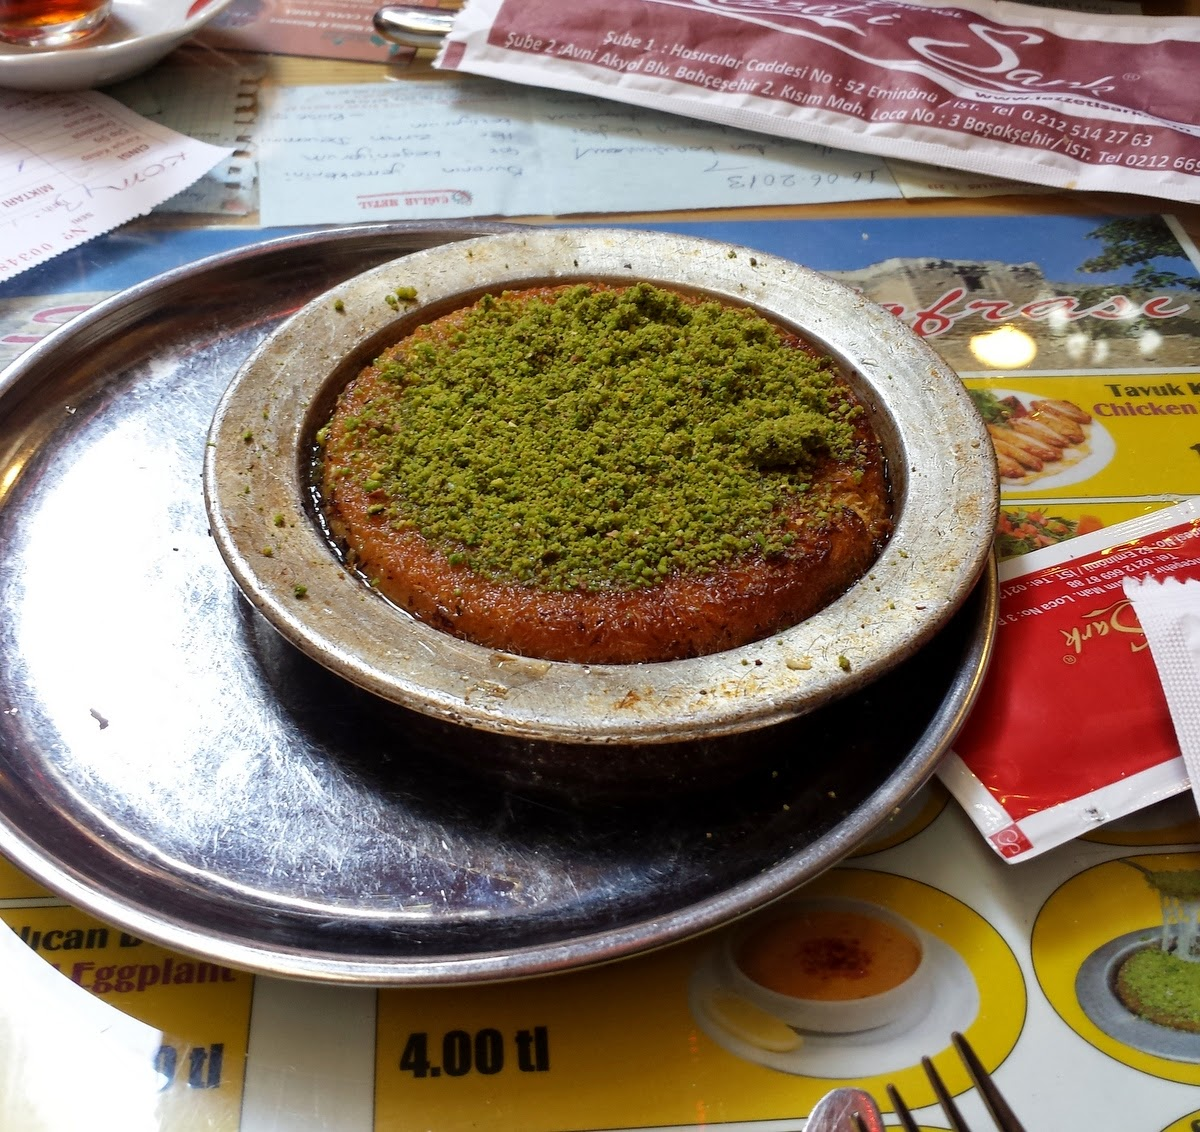 Koleksi 1001 Resepi Turkey Dan Manisan